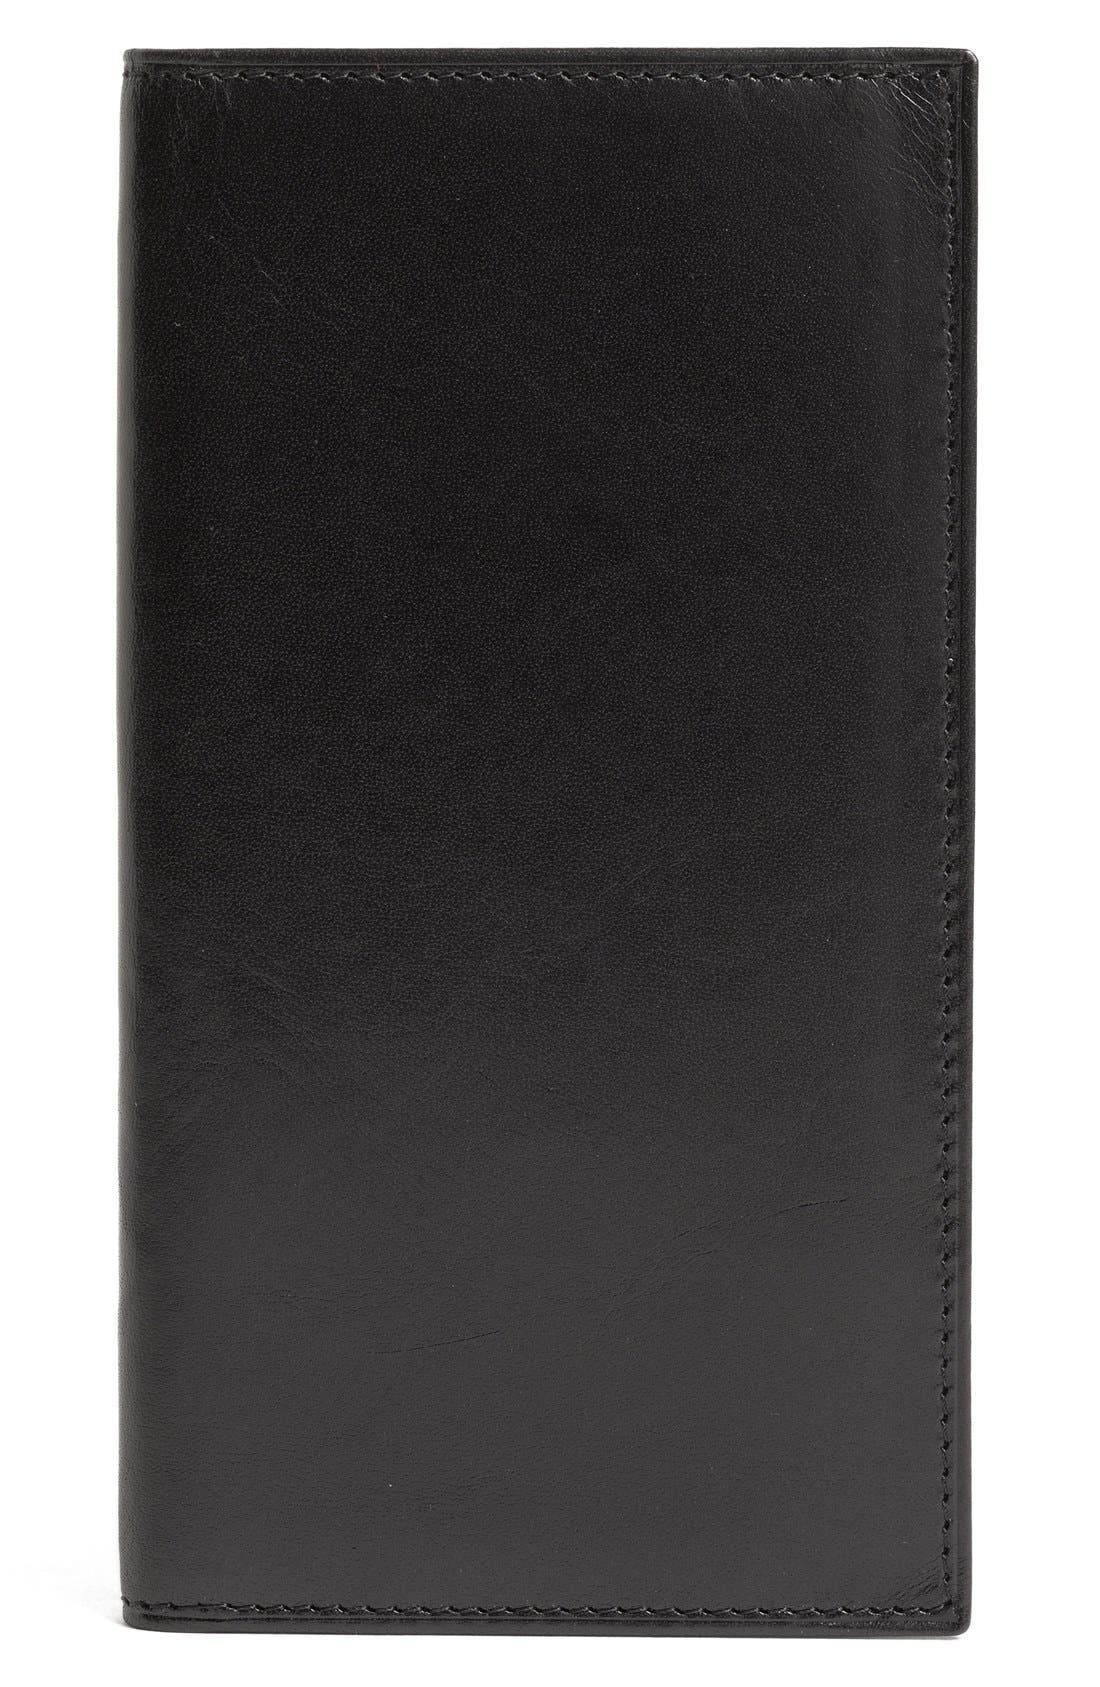 Alternate Image 1 Selected - Bosca 'Old Leather' Checkbook Wallet